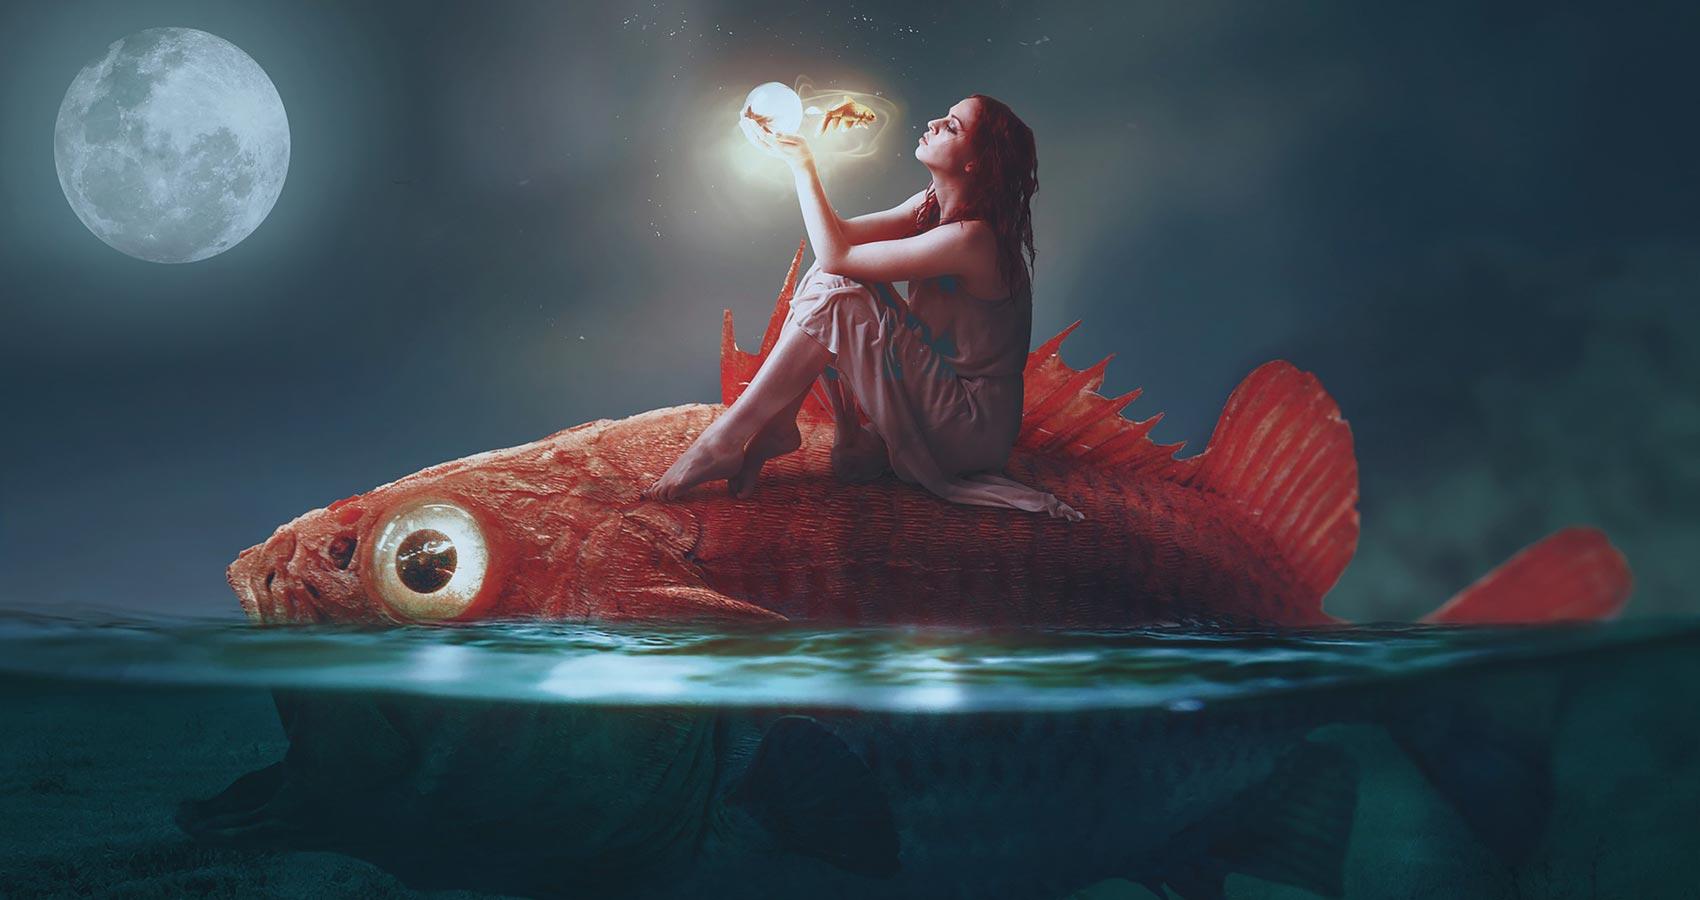 The Wind Girl - Sane or Insane? poem by Akhila Siva at Spillwords.com